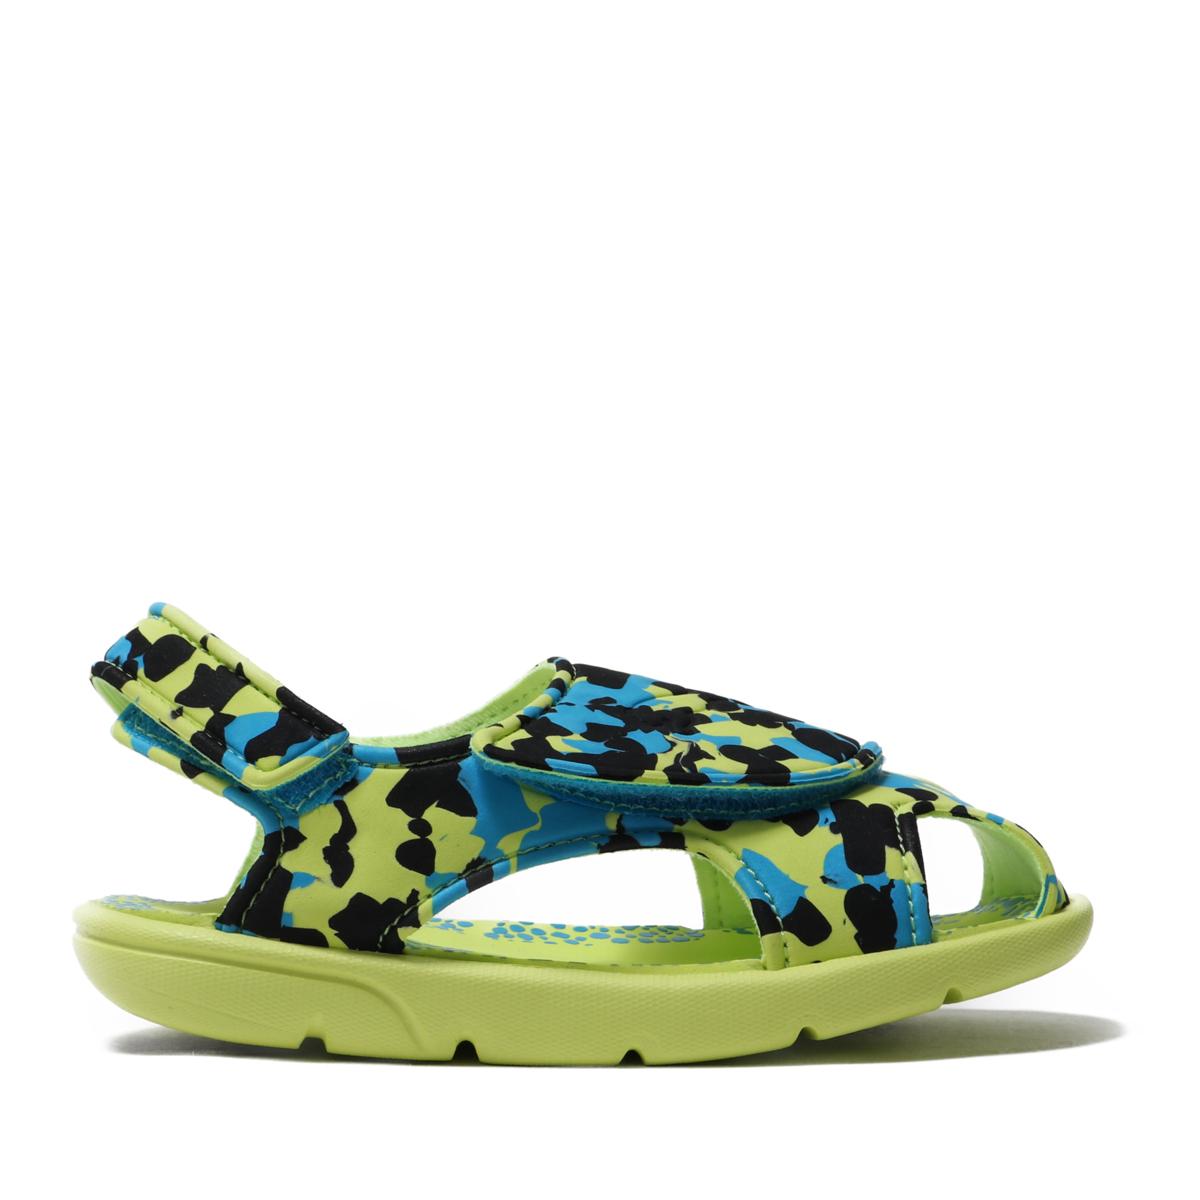 c30beaef24 PUMA SUMMER SANDAL 2 CAMO INFANT (Puma summer sandals 2 カモインファント) HAWAIIAN  OCEAN